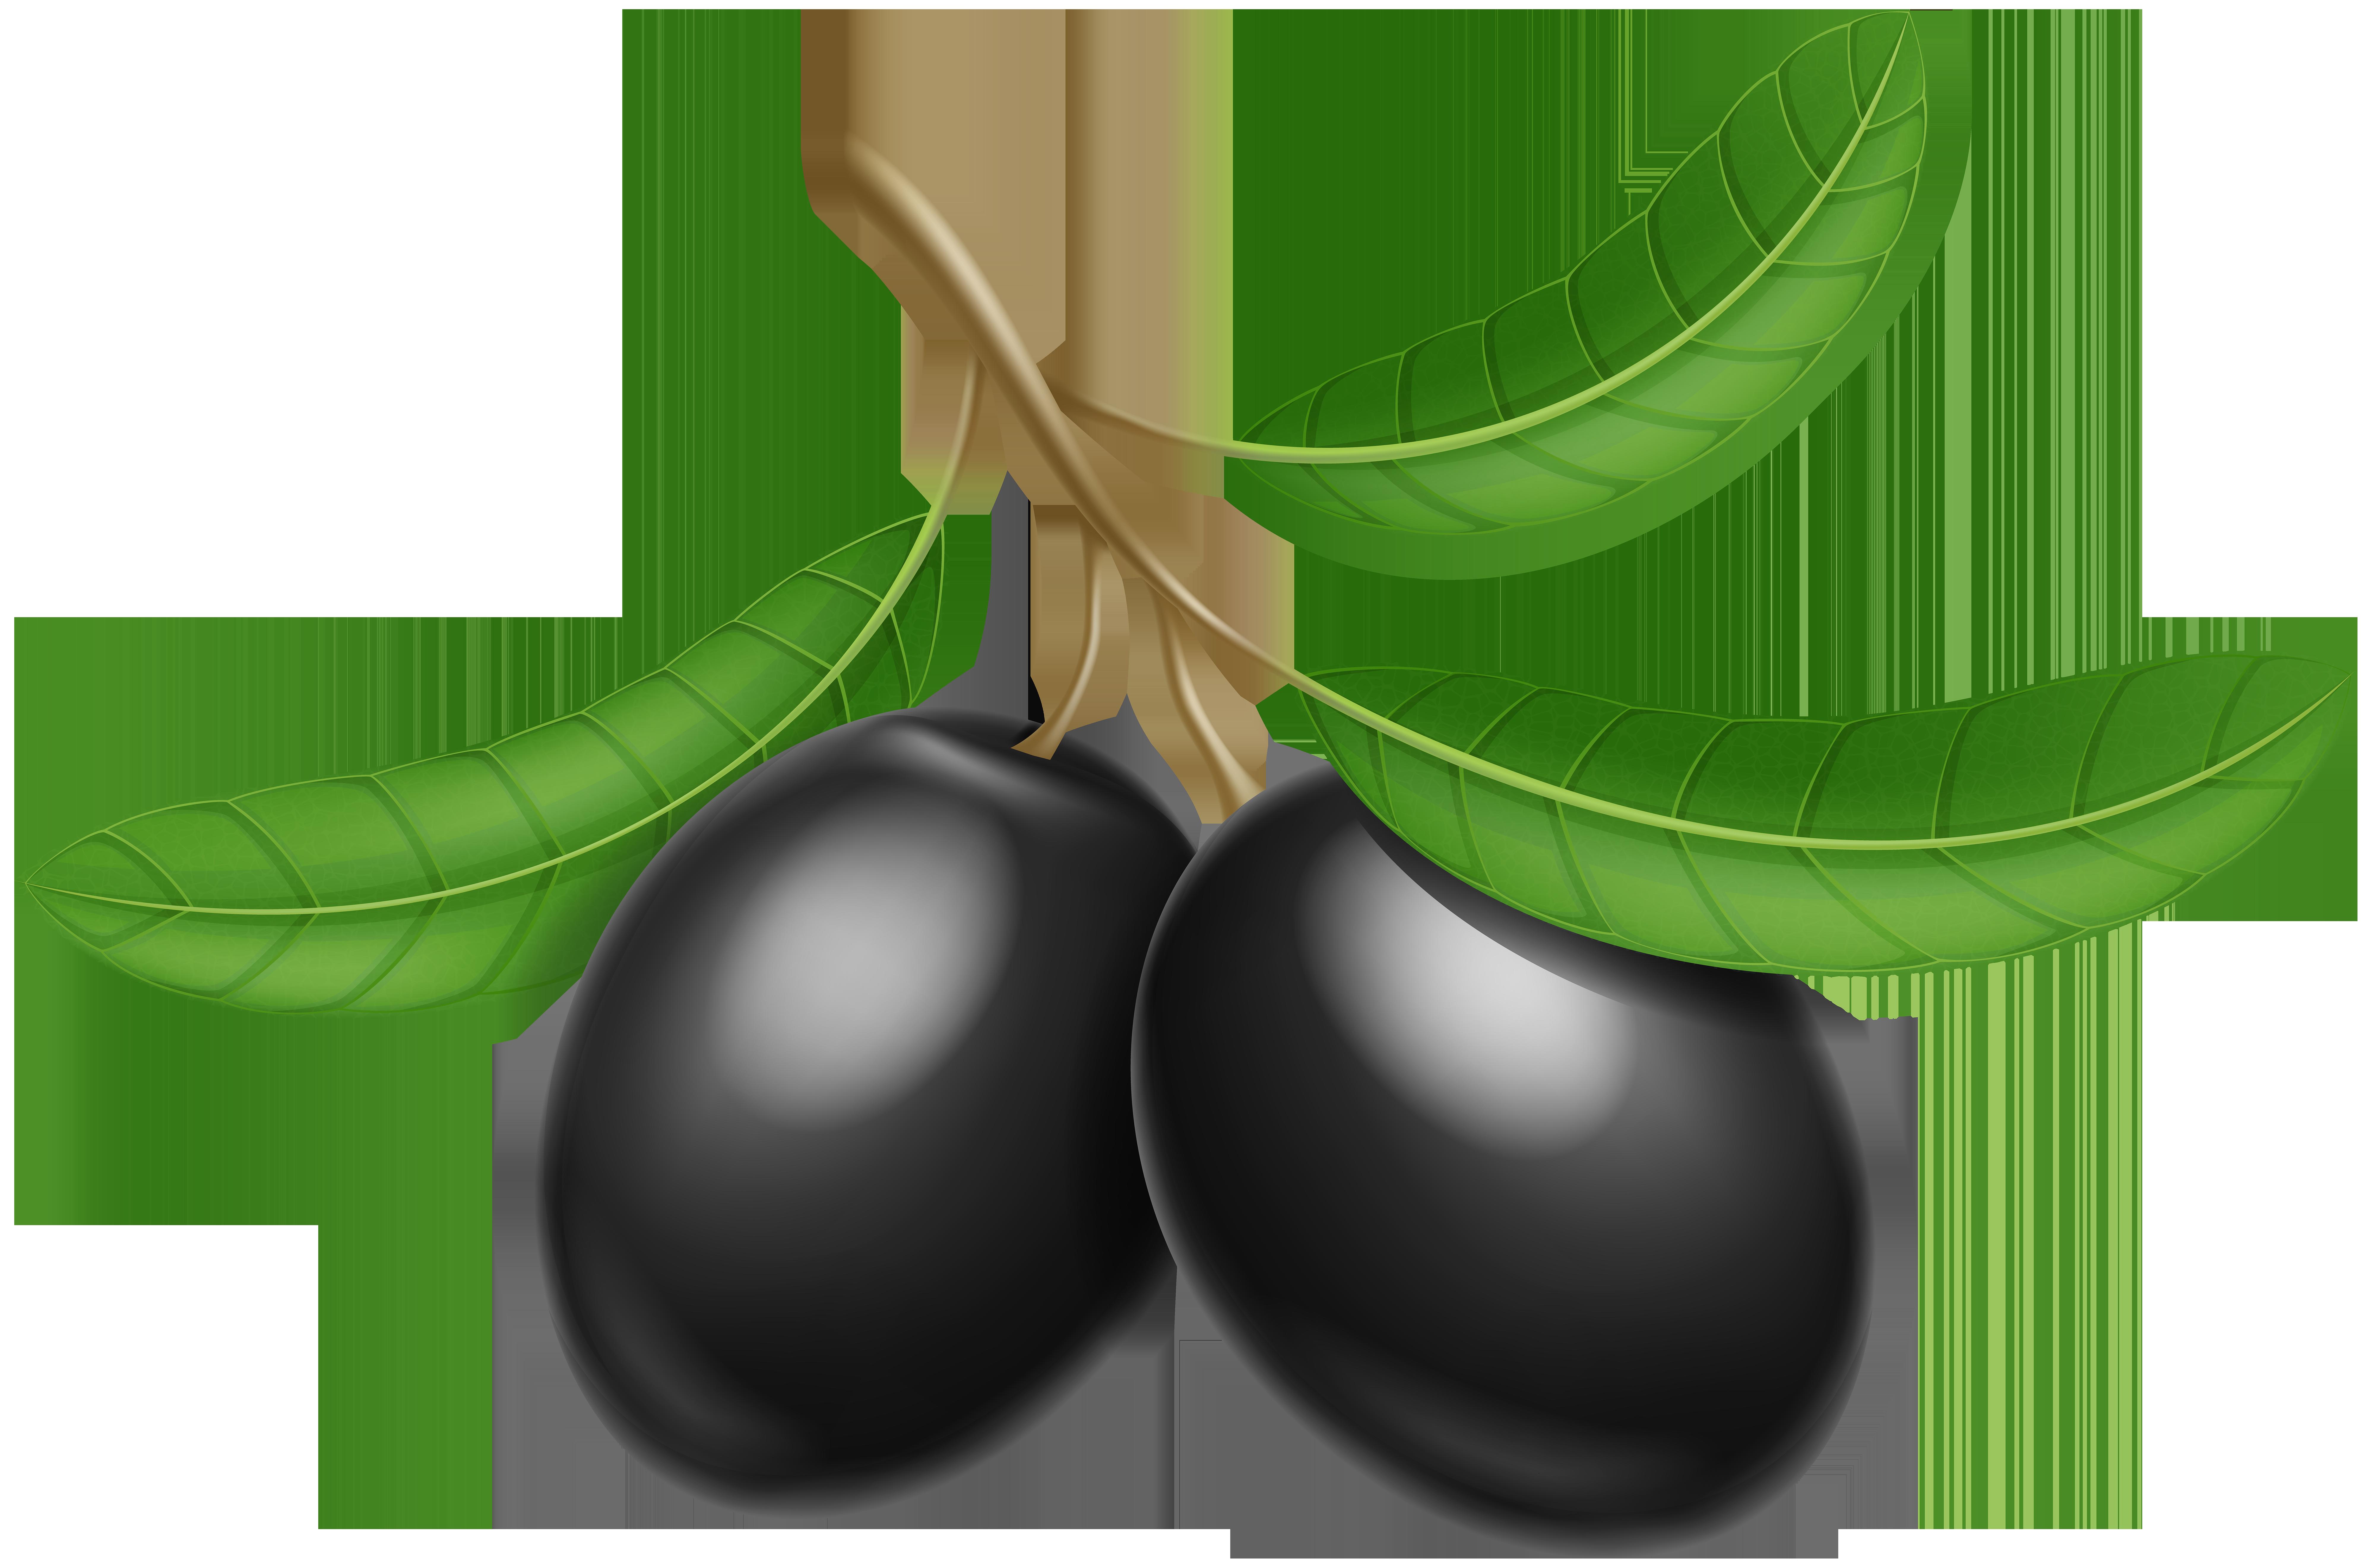 Clipart olives image freeuse stock Black Olives Transparent PNG Clip Art Image | Gallery Yopriceville ... image freeuse stock